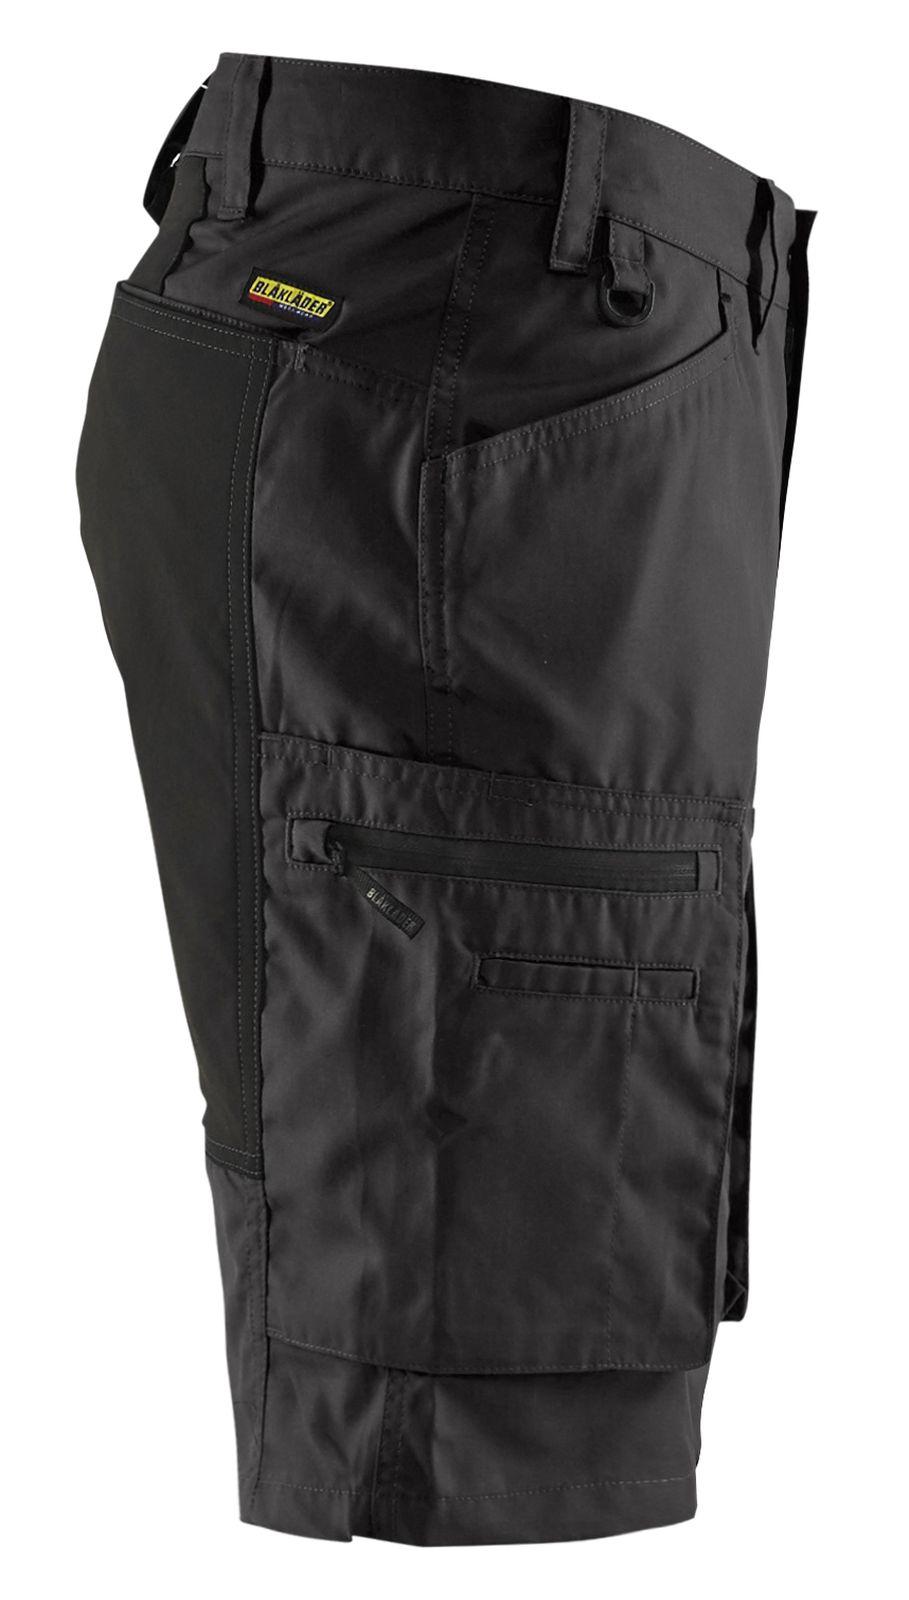 Blaklader Broeken 14491845 met Stretch zwart(9900)